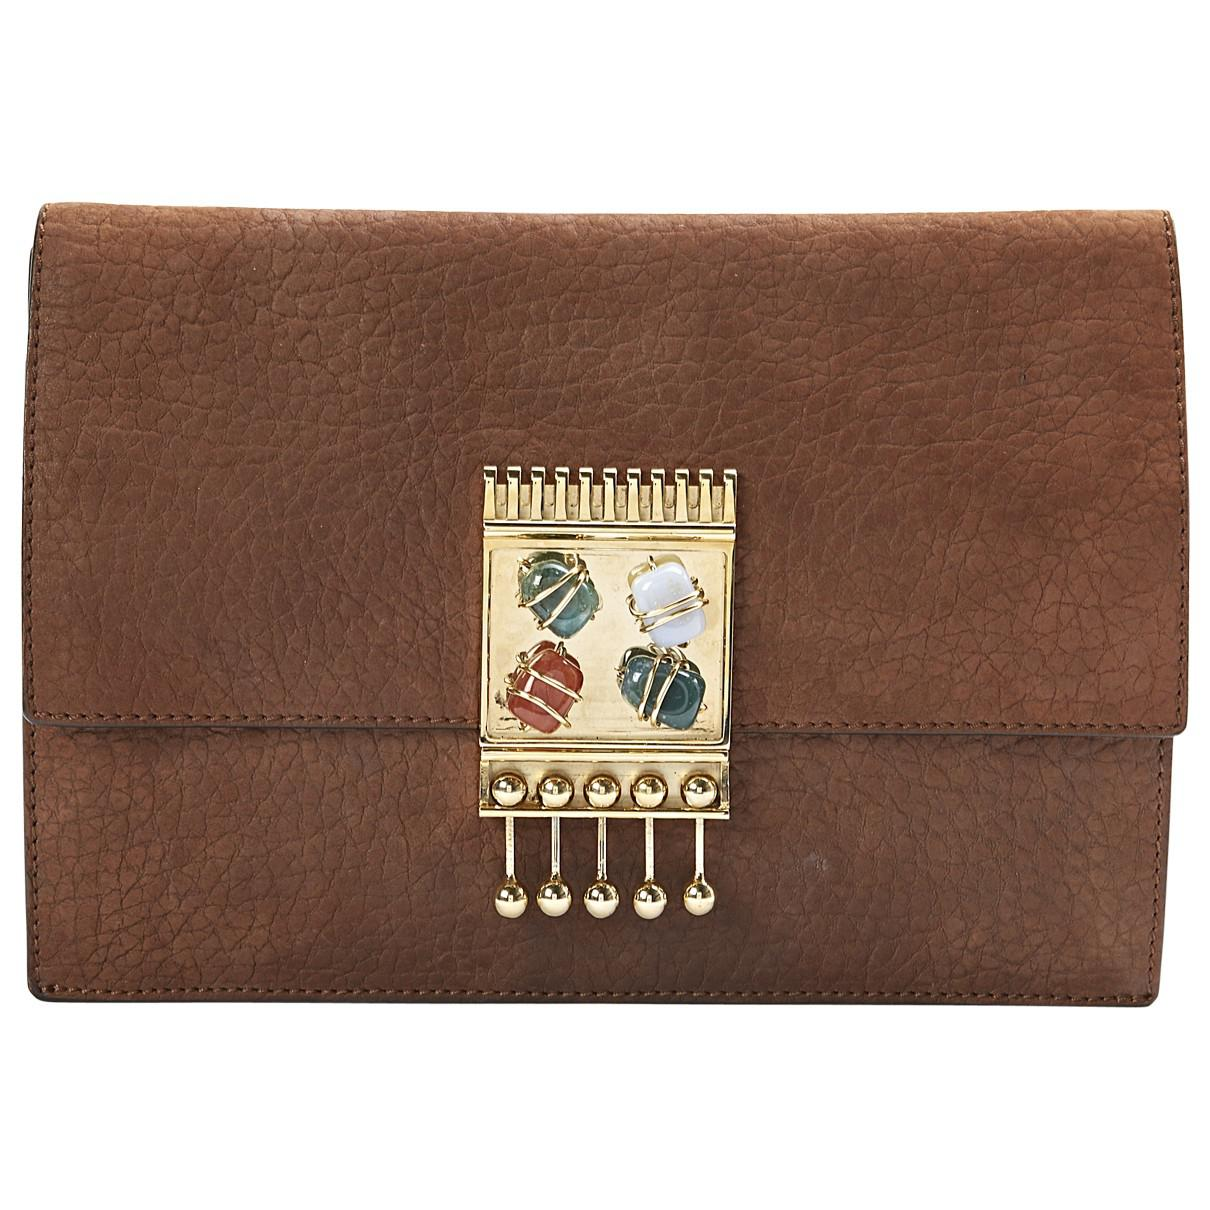 Missoni Pre-owned - Cloth clutch bag 3JBqfYzJ